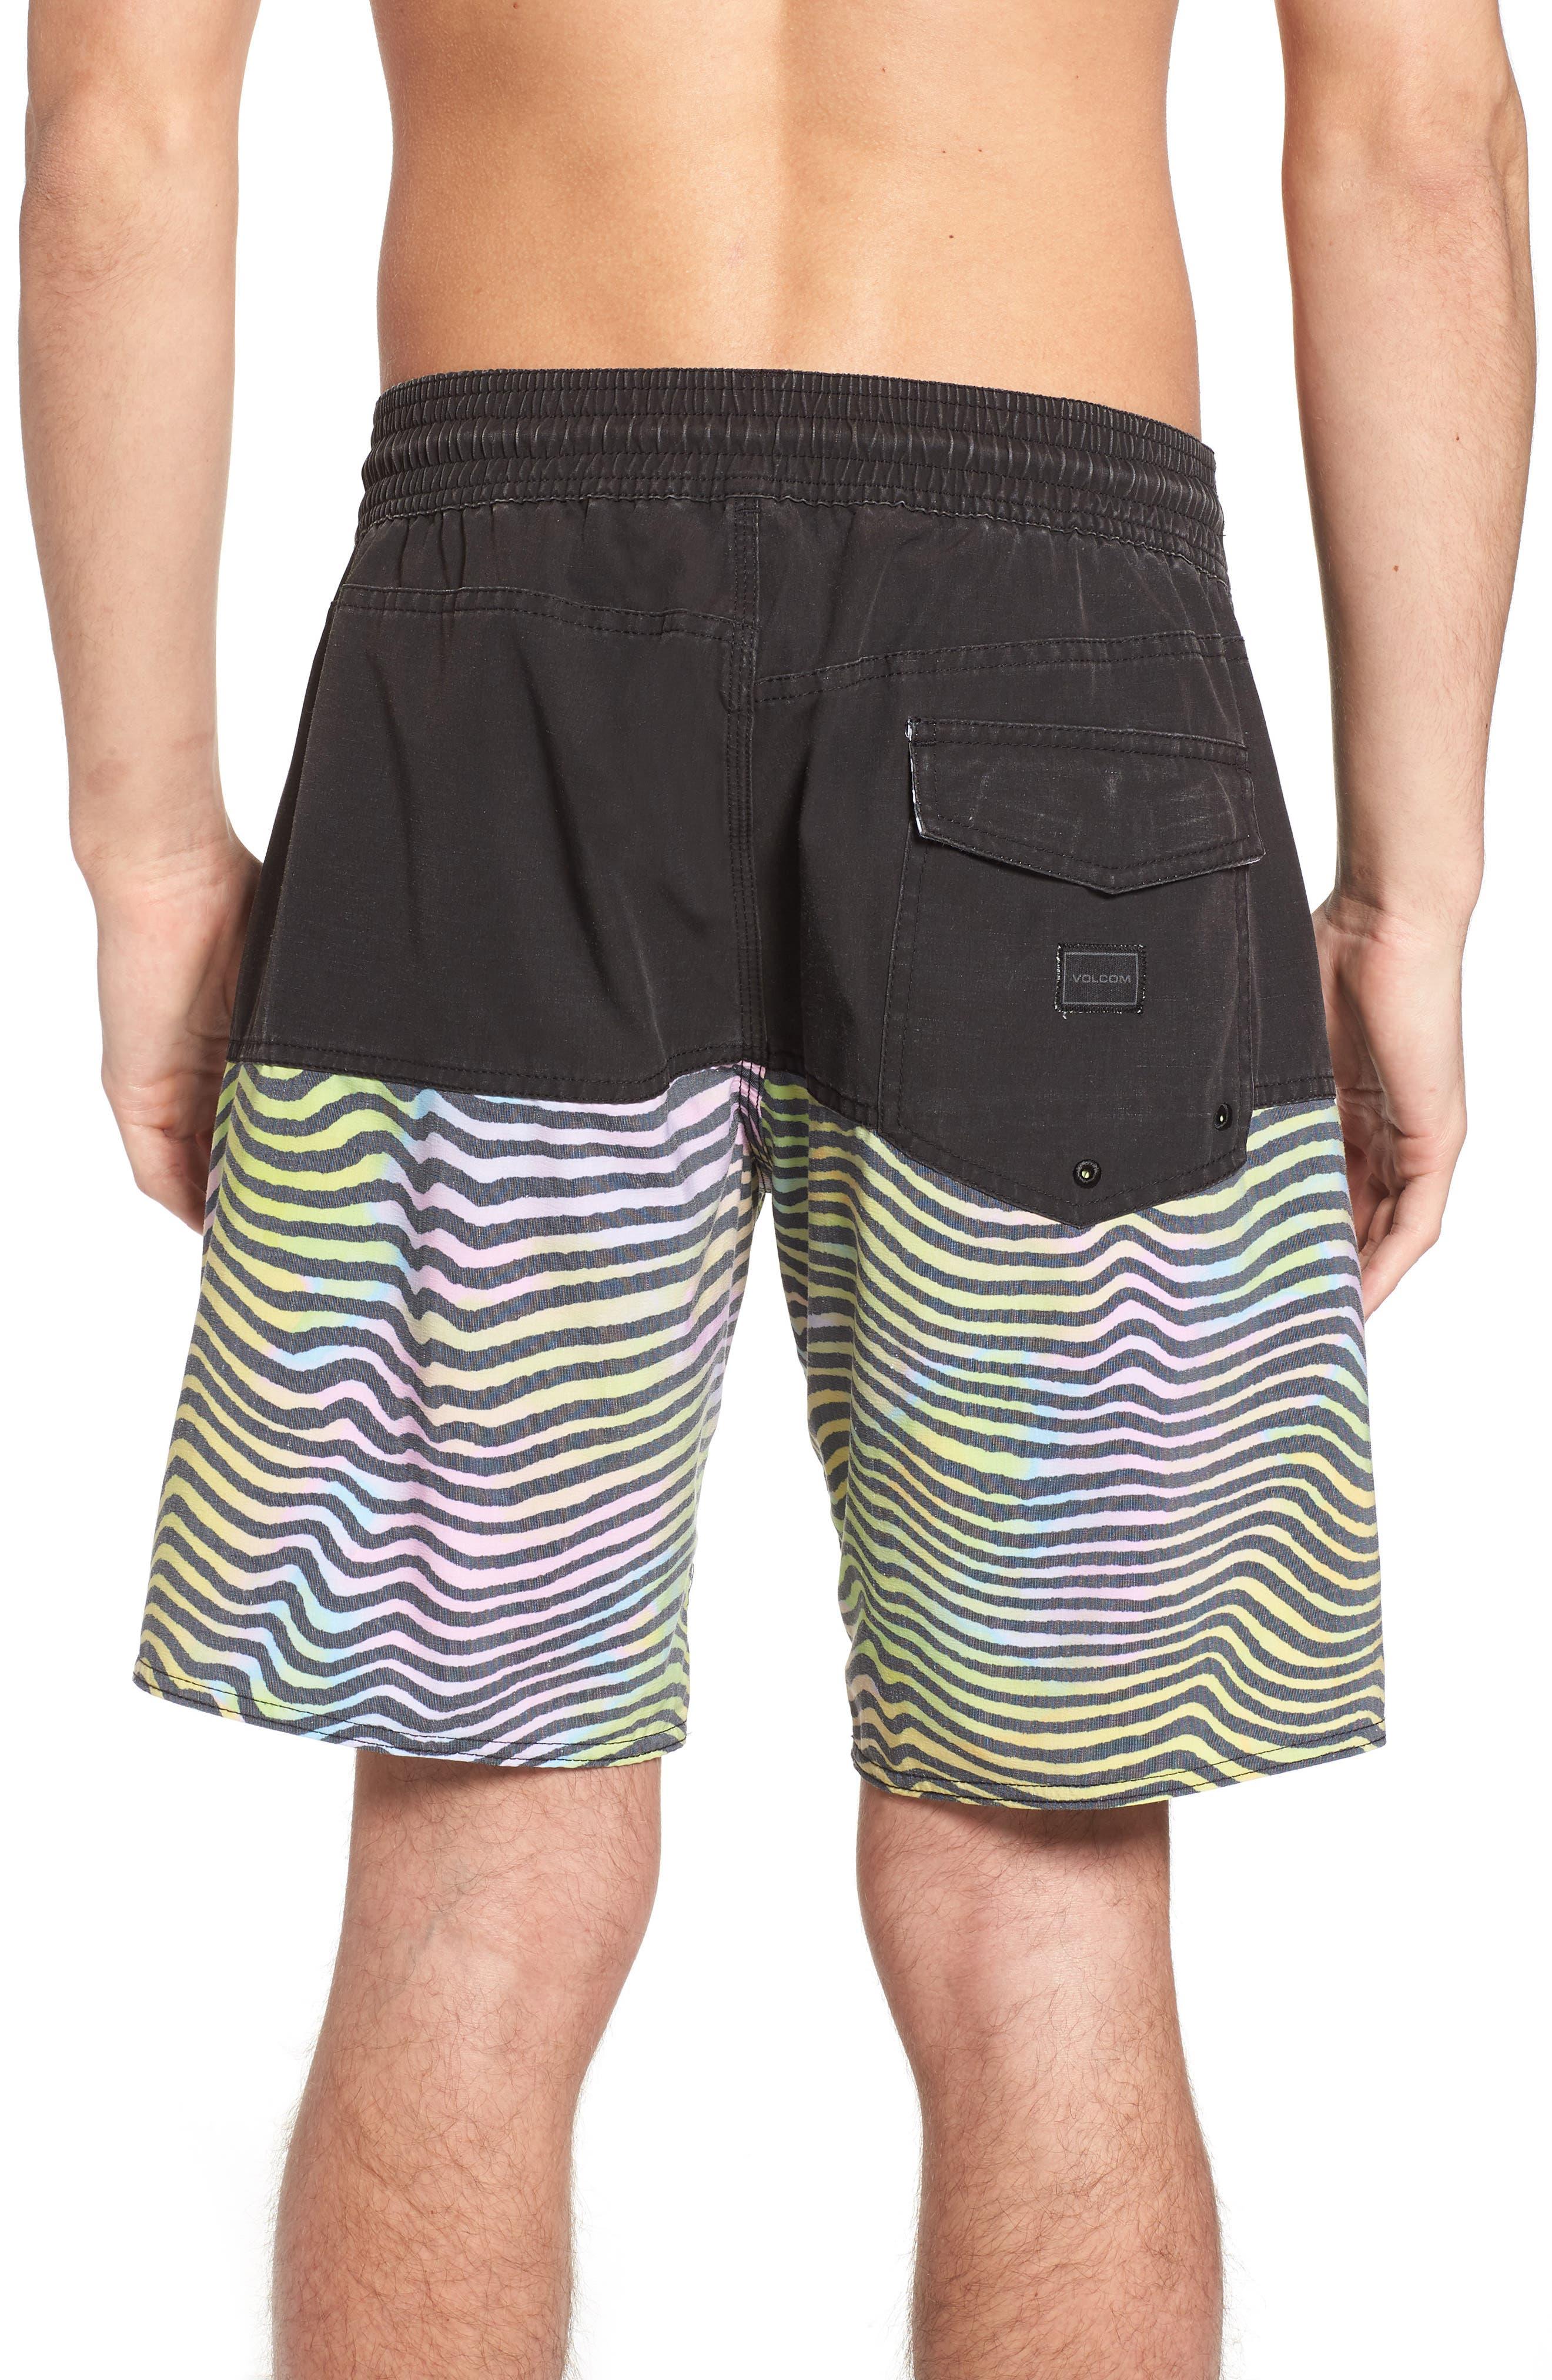 Vibes Half Stoney Board Shorts,                             Alternate thumbnail 2, color,                             Multi